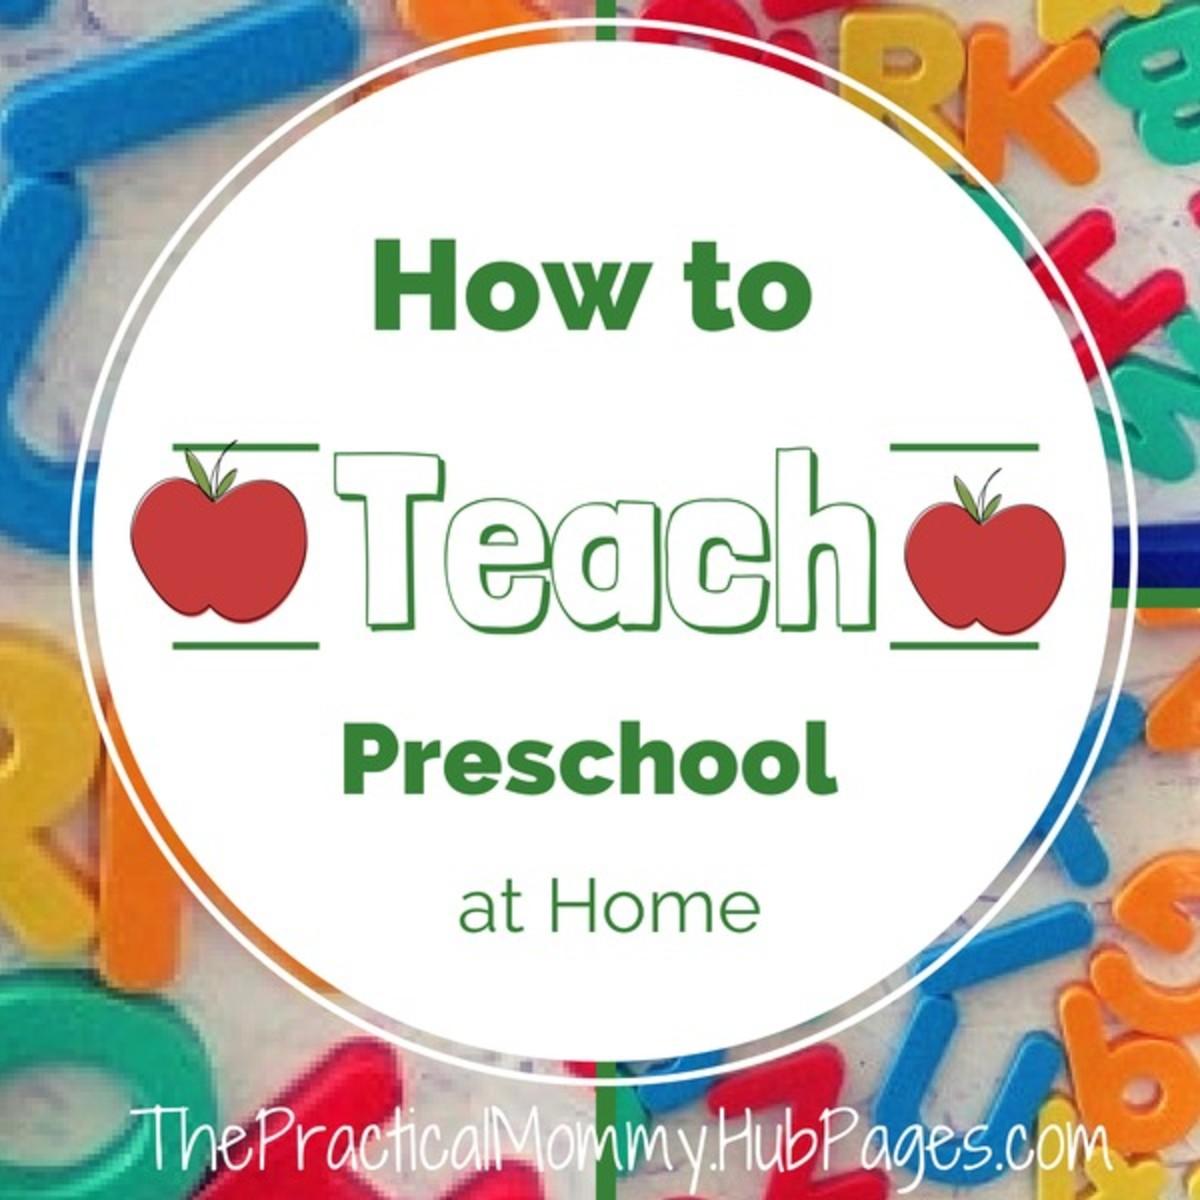 How To Teach Preschool At Home